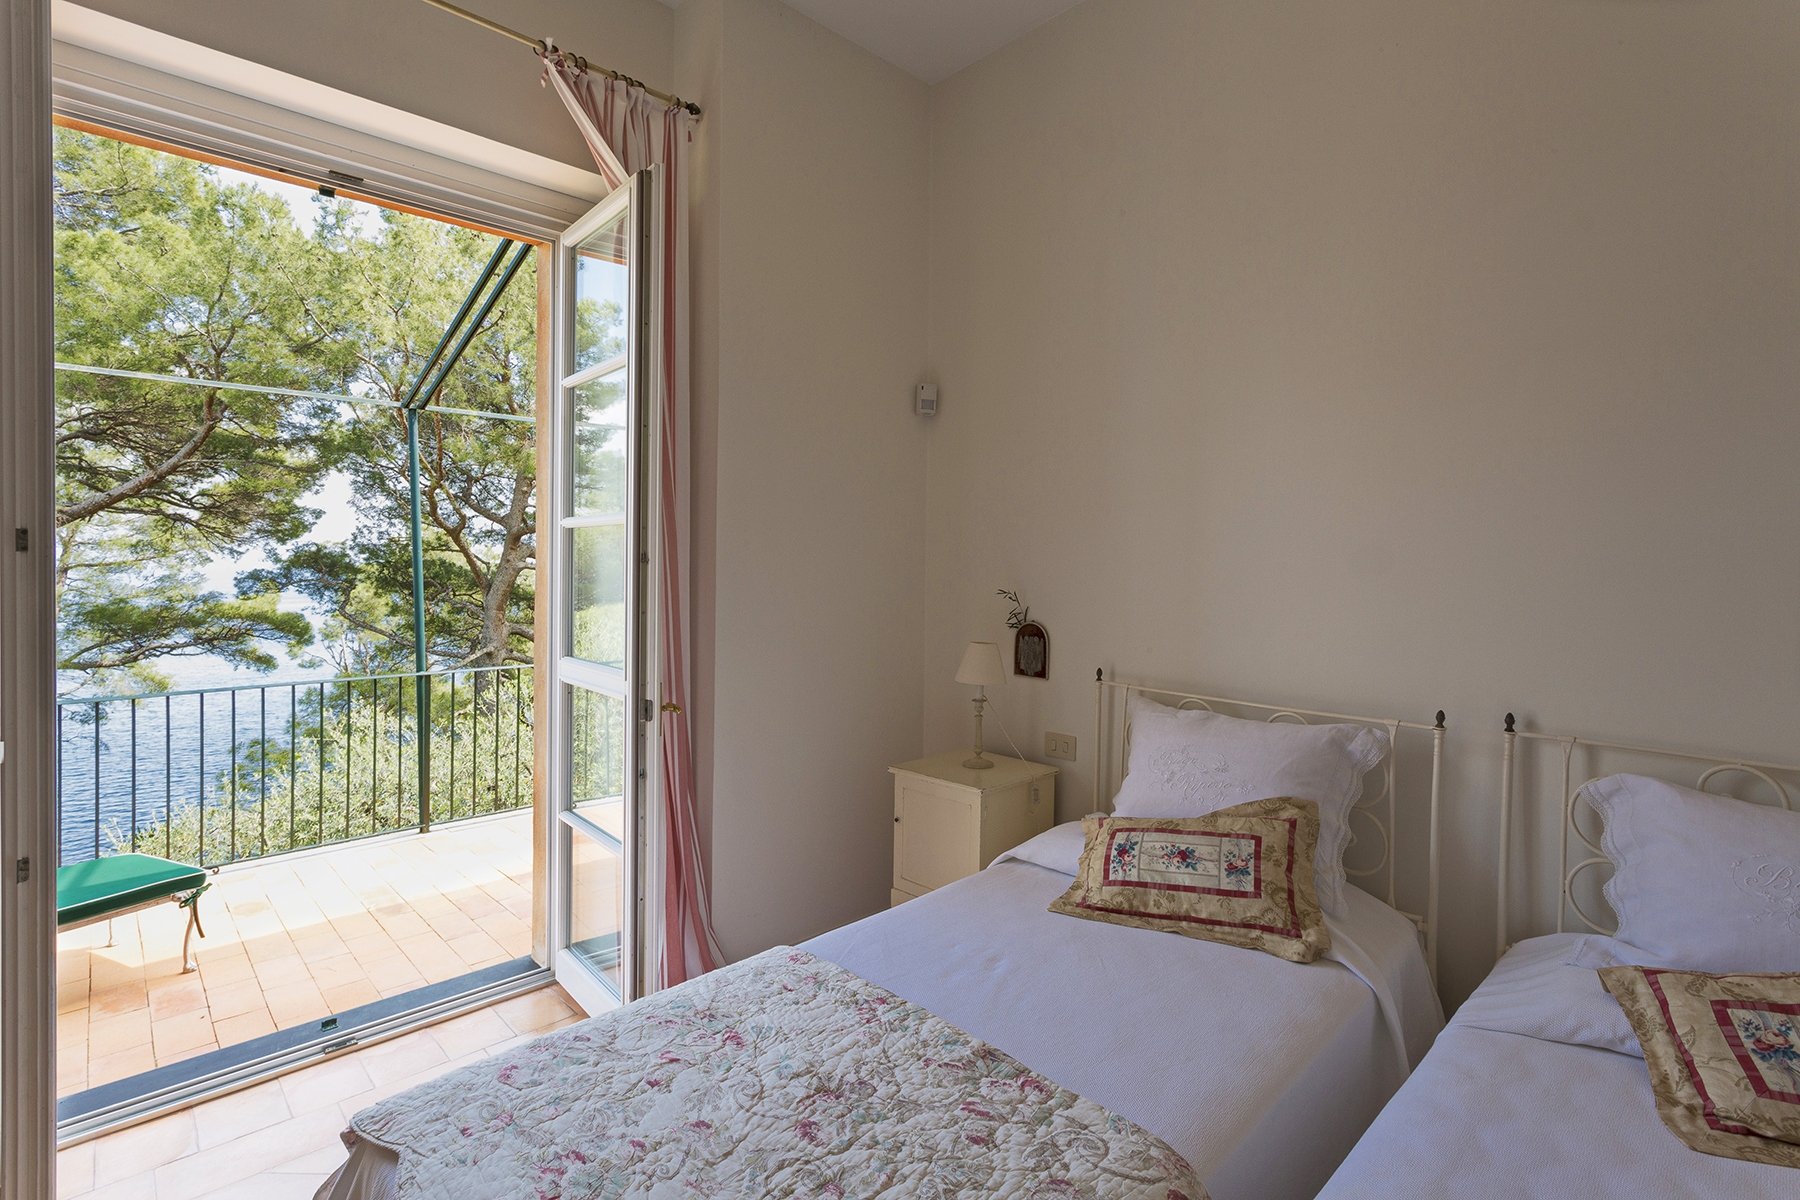 Villa in Vendita a Santa Margherita Ligure: 5 locali, 580 mq - Foto 26